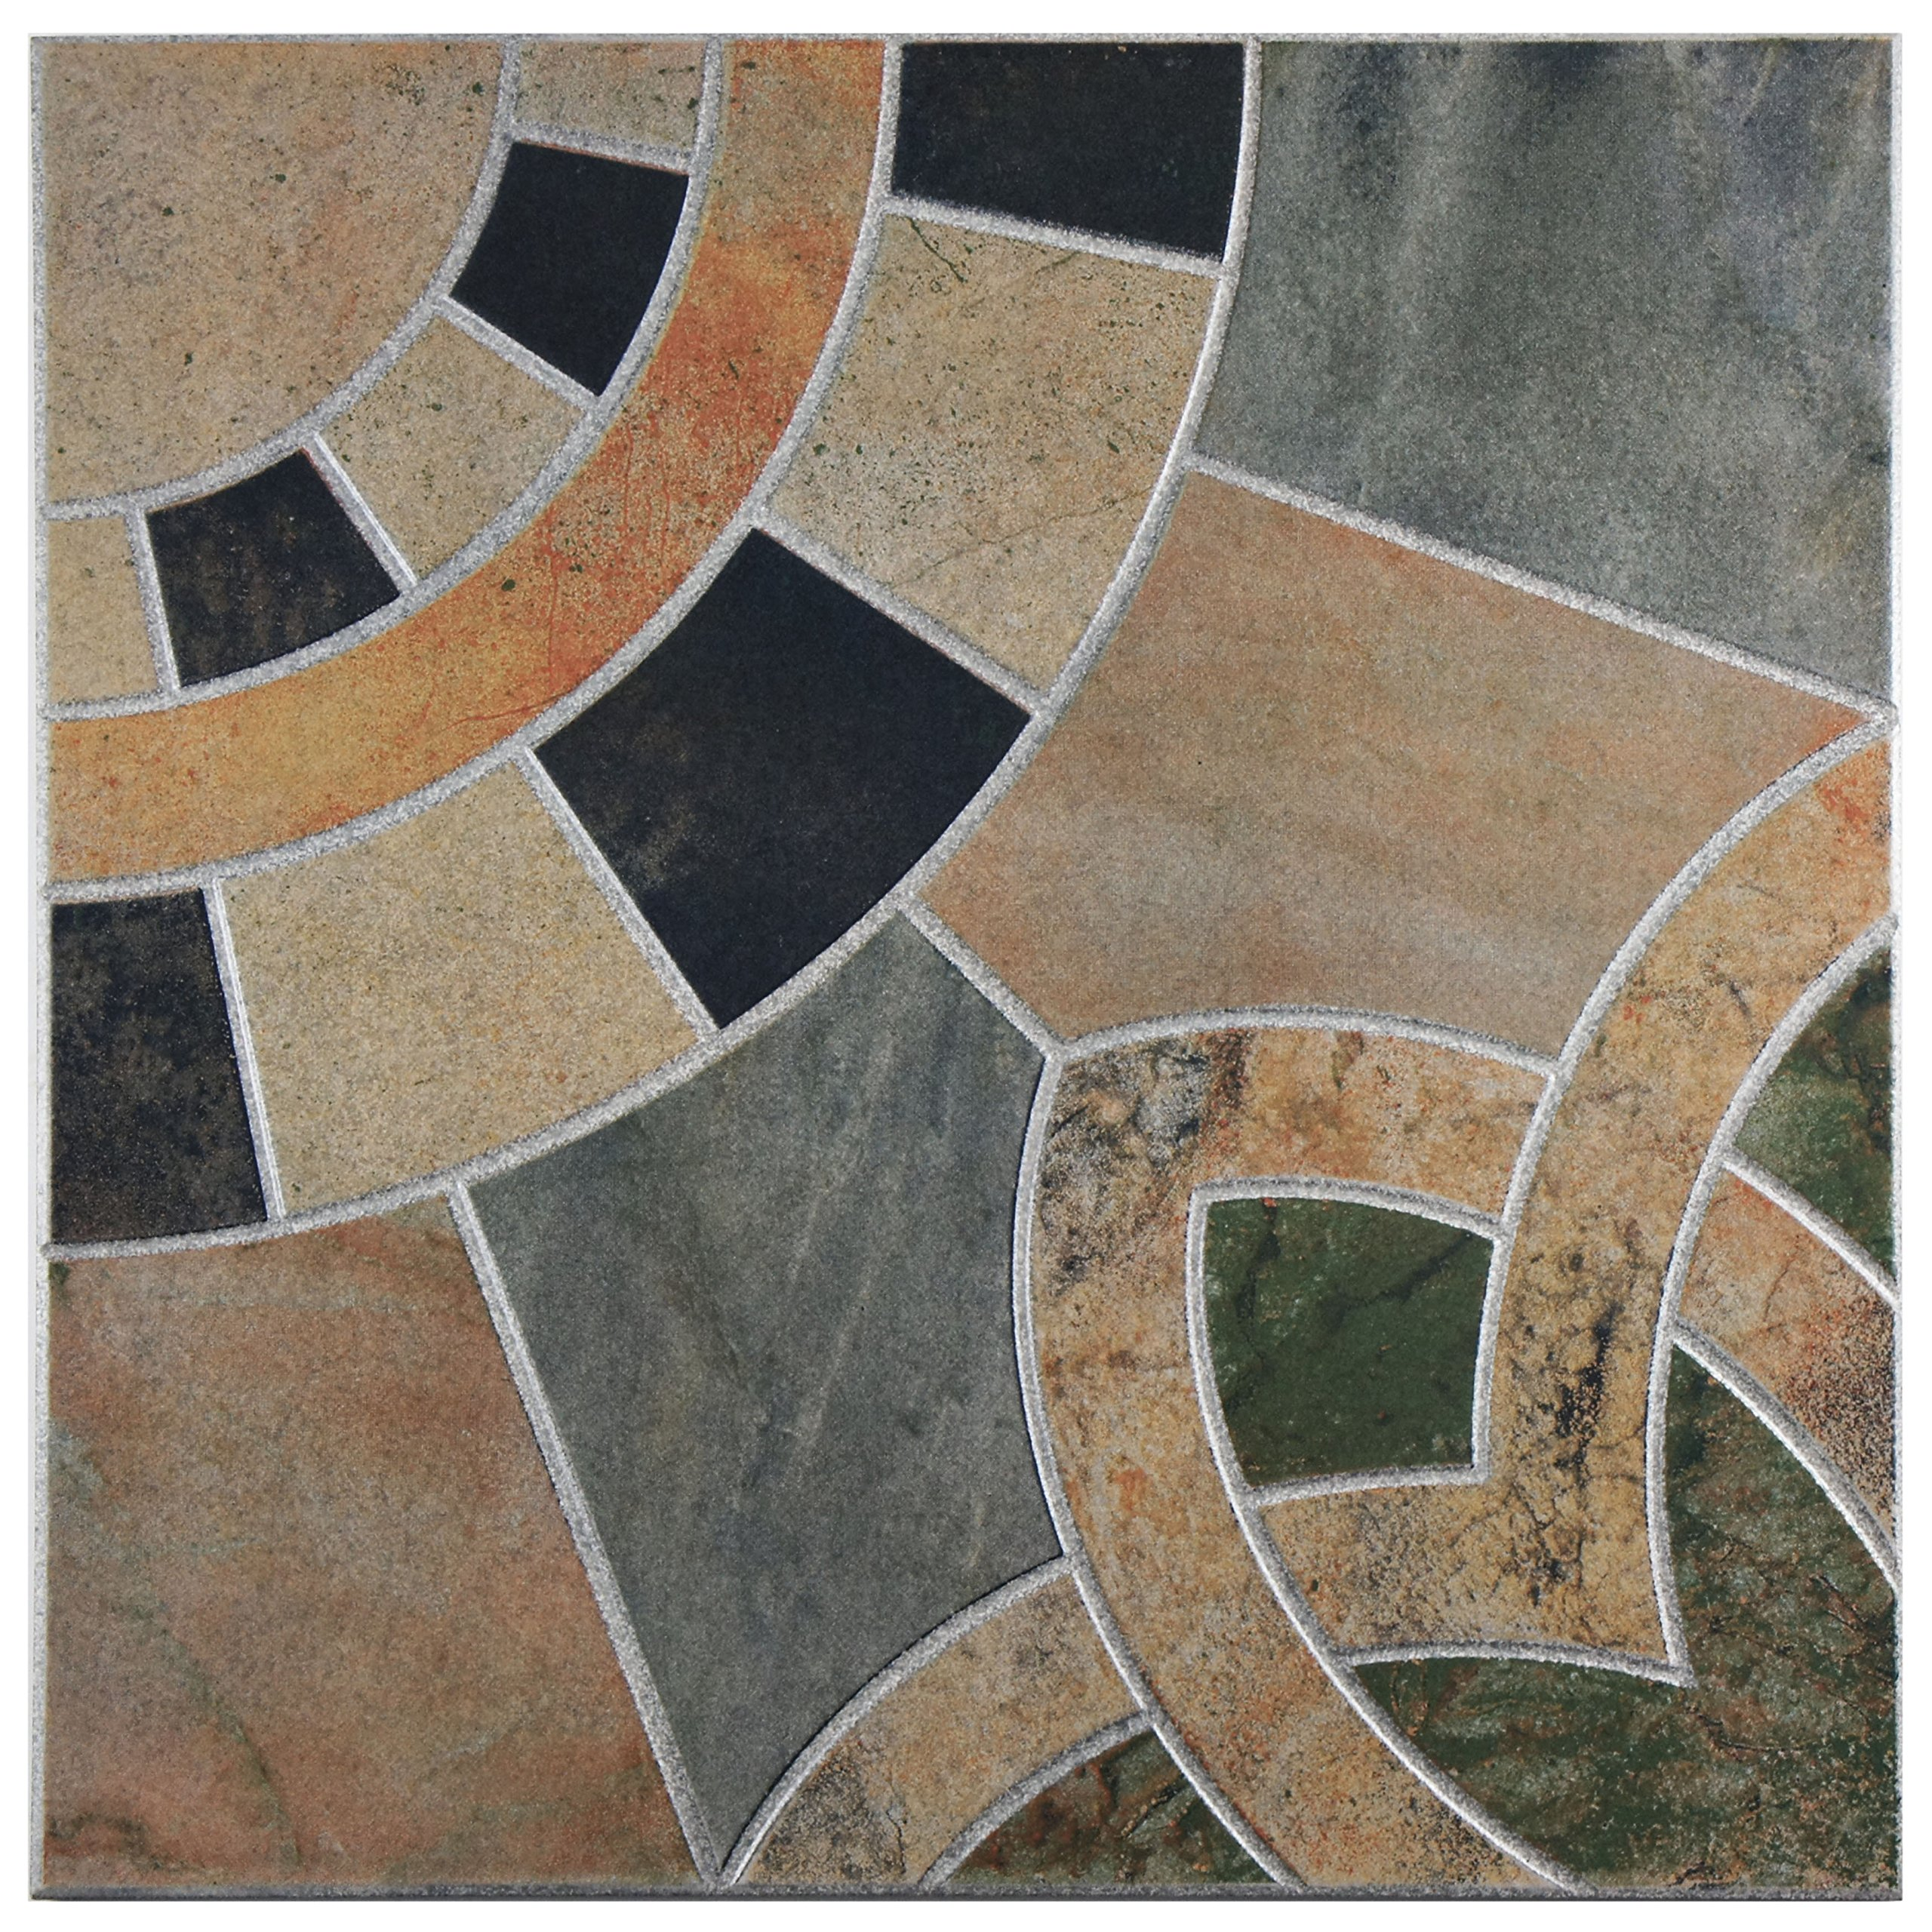 SomerTile Grey/Orange/Black/Beige/Green FEM18CTA Marta Ceramic Floor and Wall Tile, 17.75'' x 17.75'', Azul